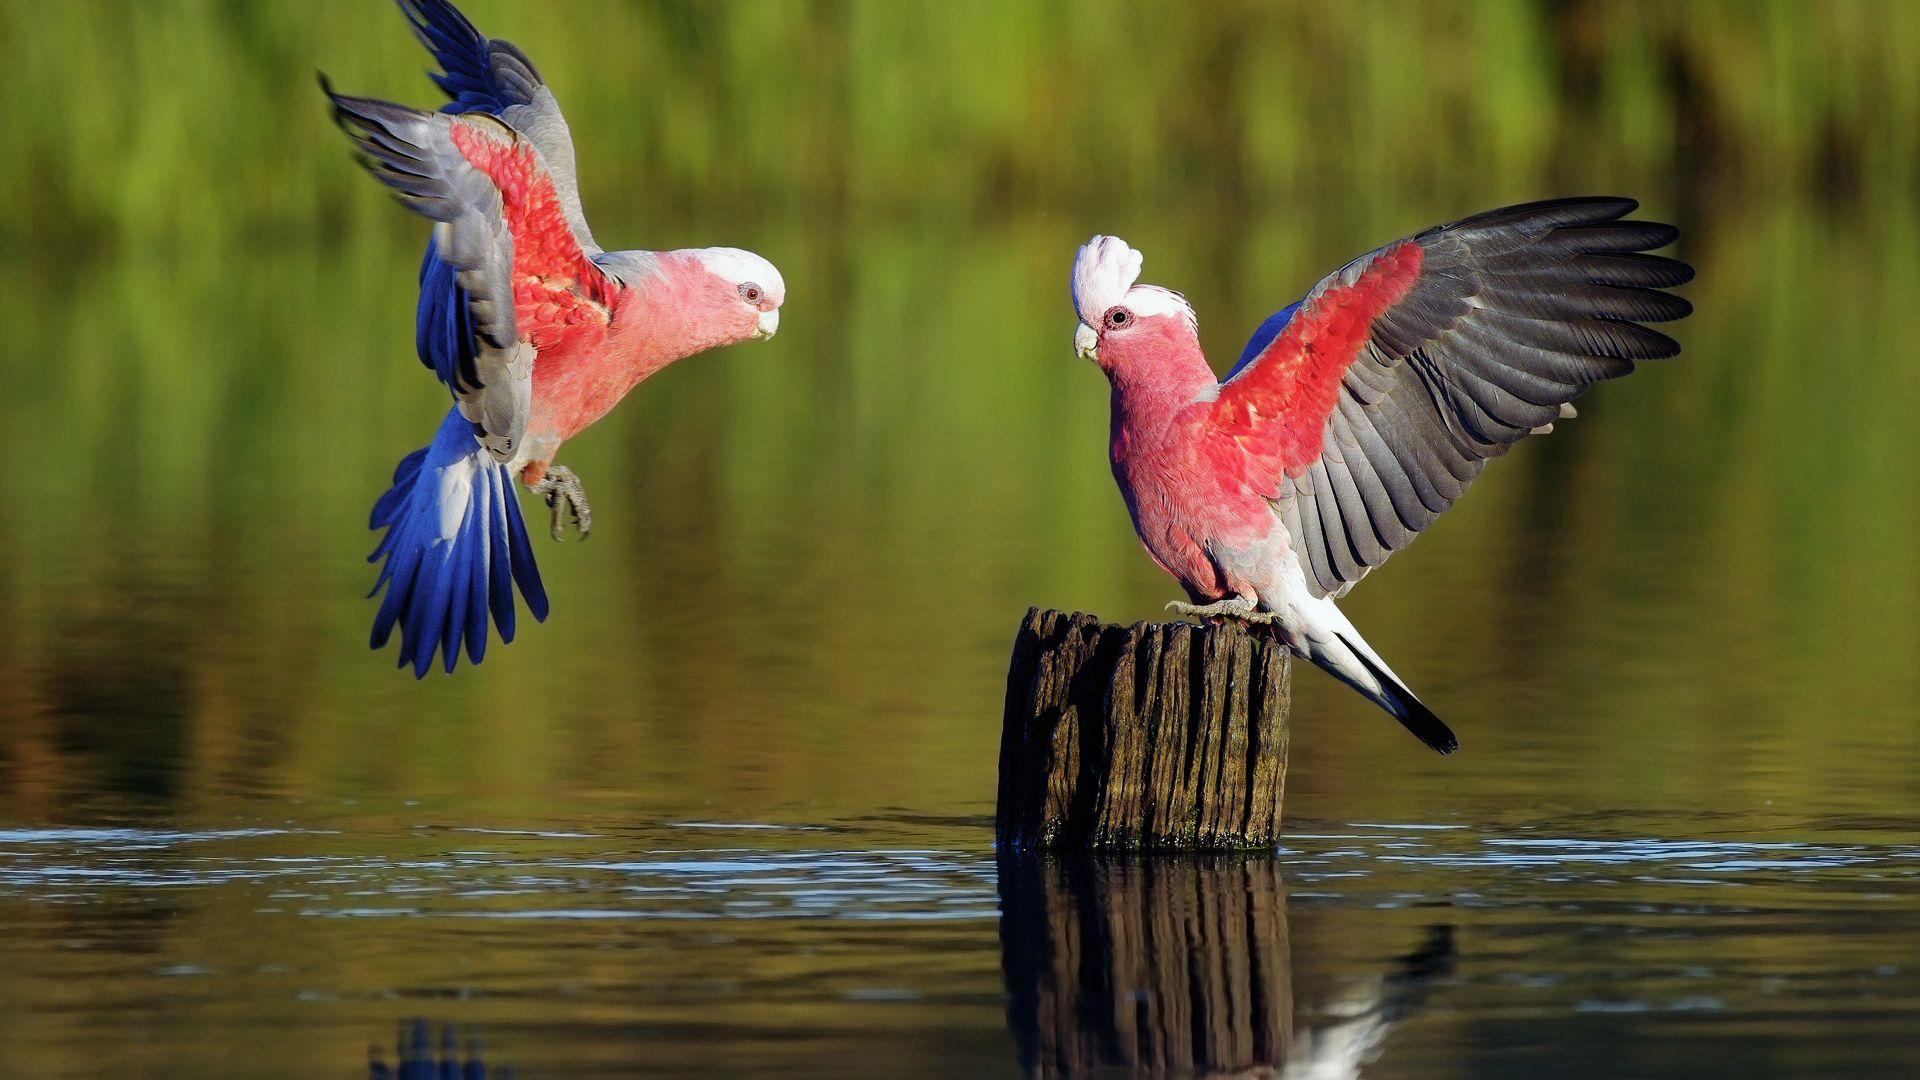 Beautiful Parrots Pictures Wallpaperia Com Beautiful Bird Wallpaper Animals Birds Wallpaper Hd